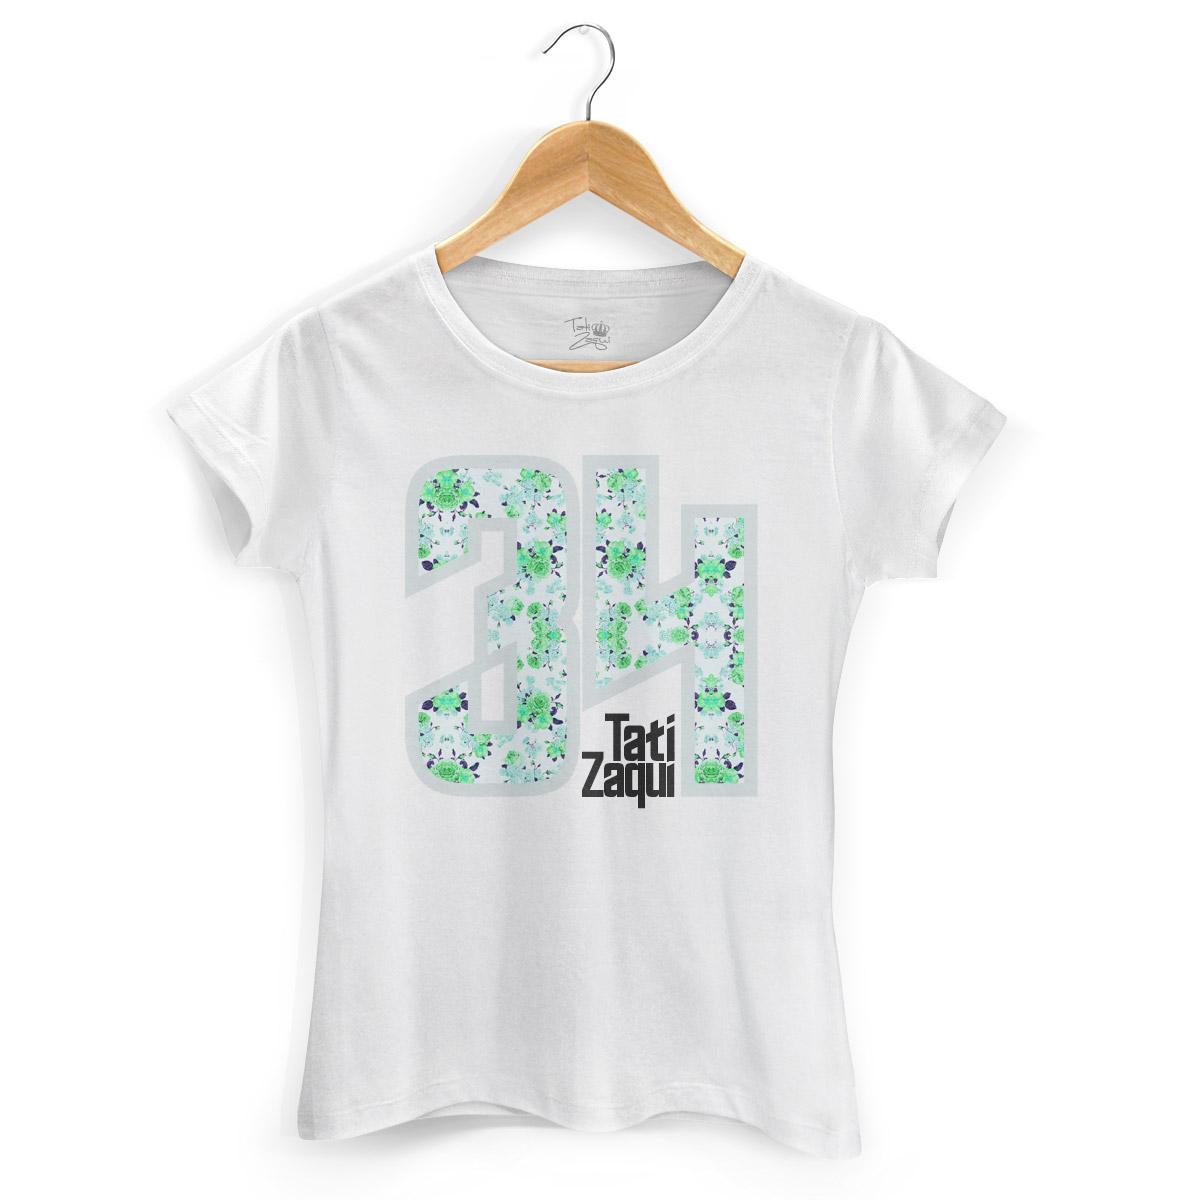 Camiseta Feminina MC Tati Zaqui 34 Flowers